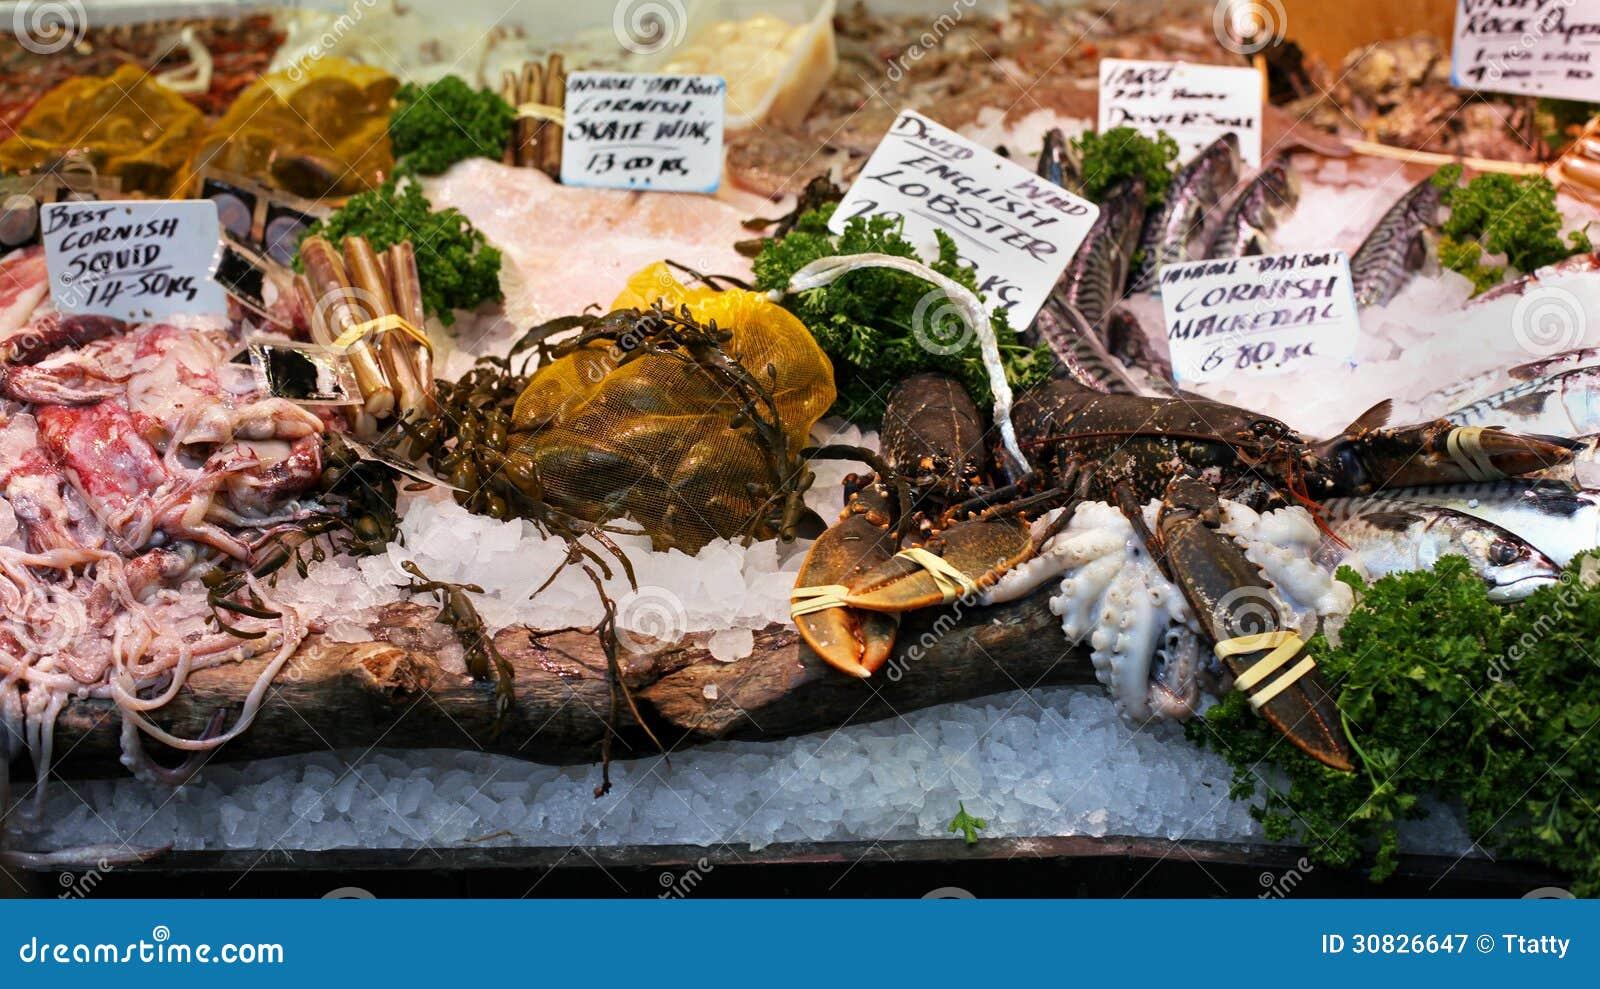 Mercato dei crostacei